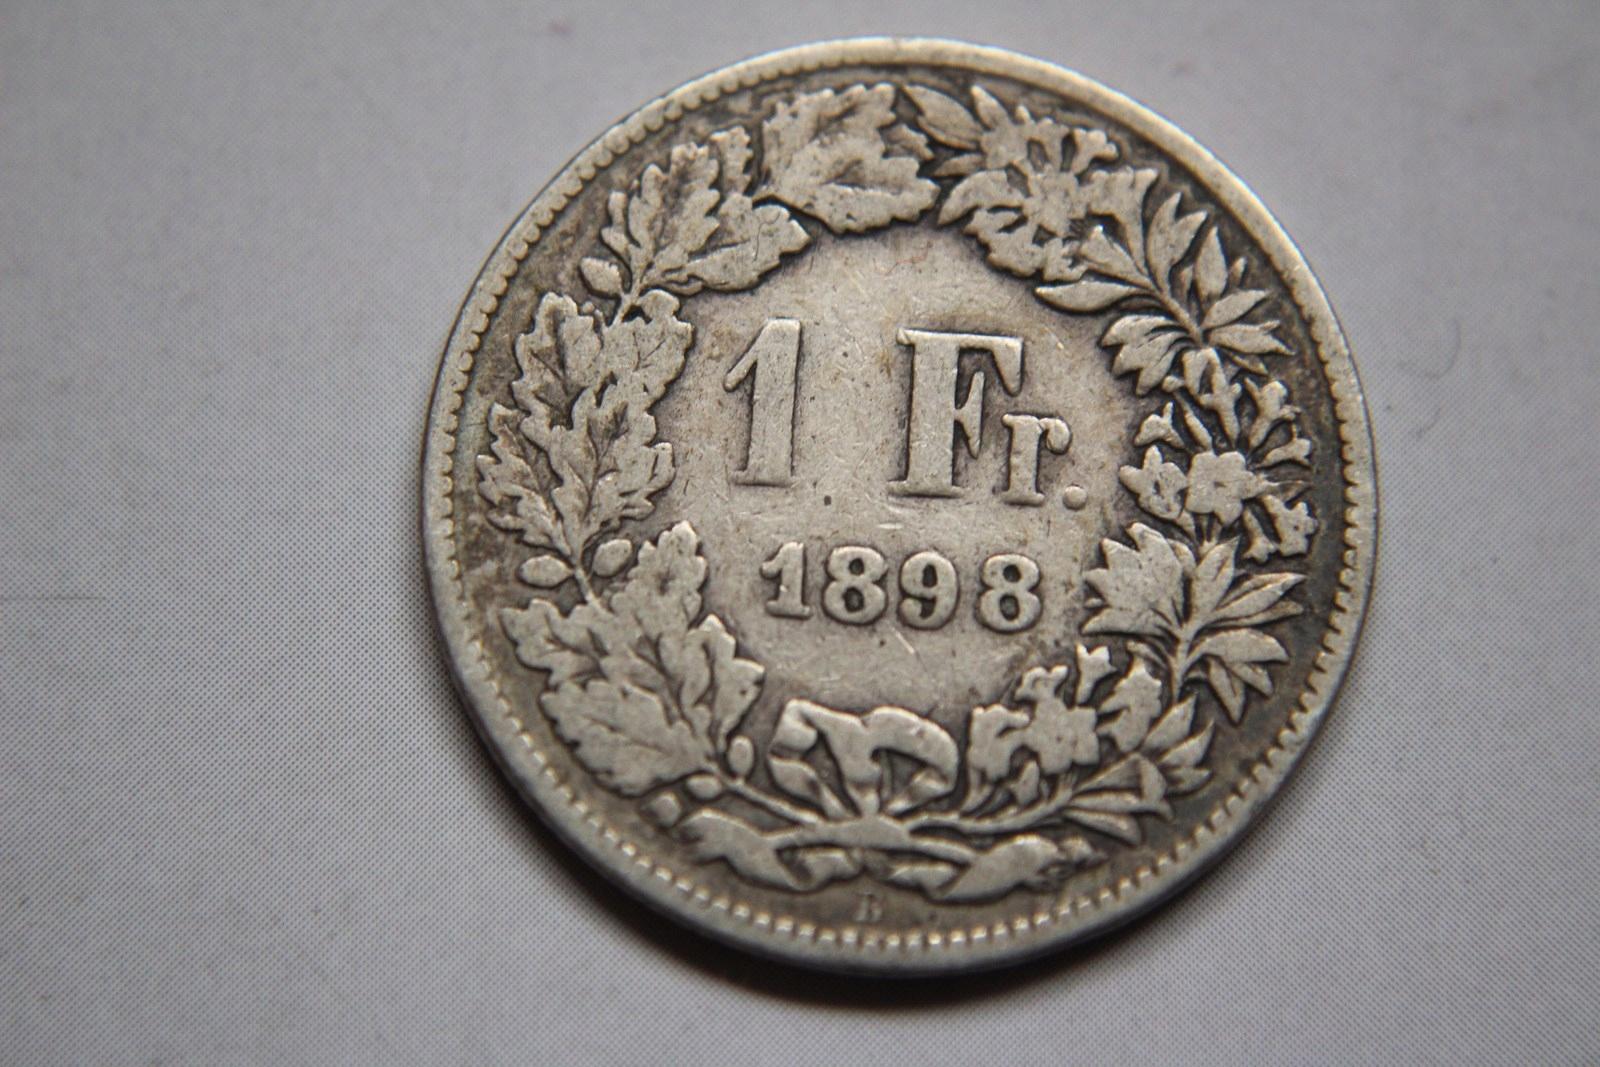 1 FRANK 1898 R. SZWAJCARIA SREBRO - CC865